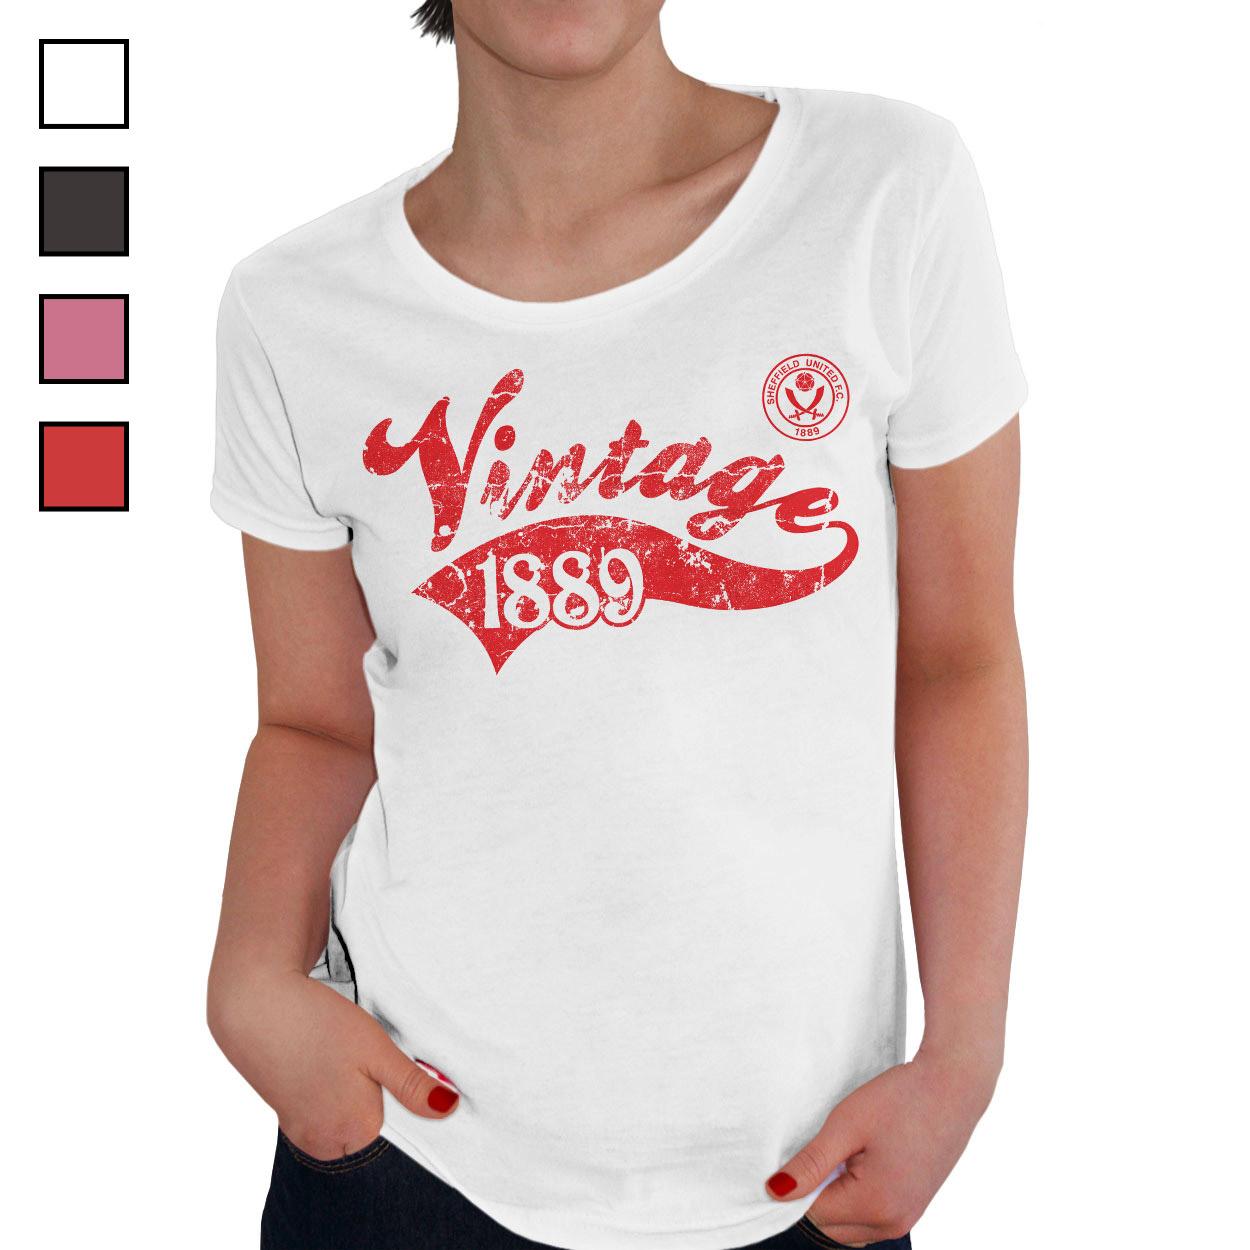 Sheffield United FC Ladies Vintage T-Shirt